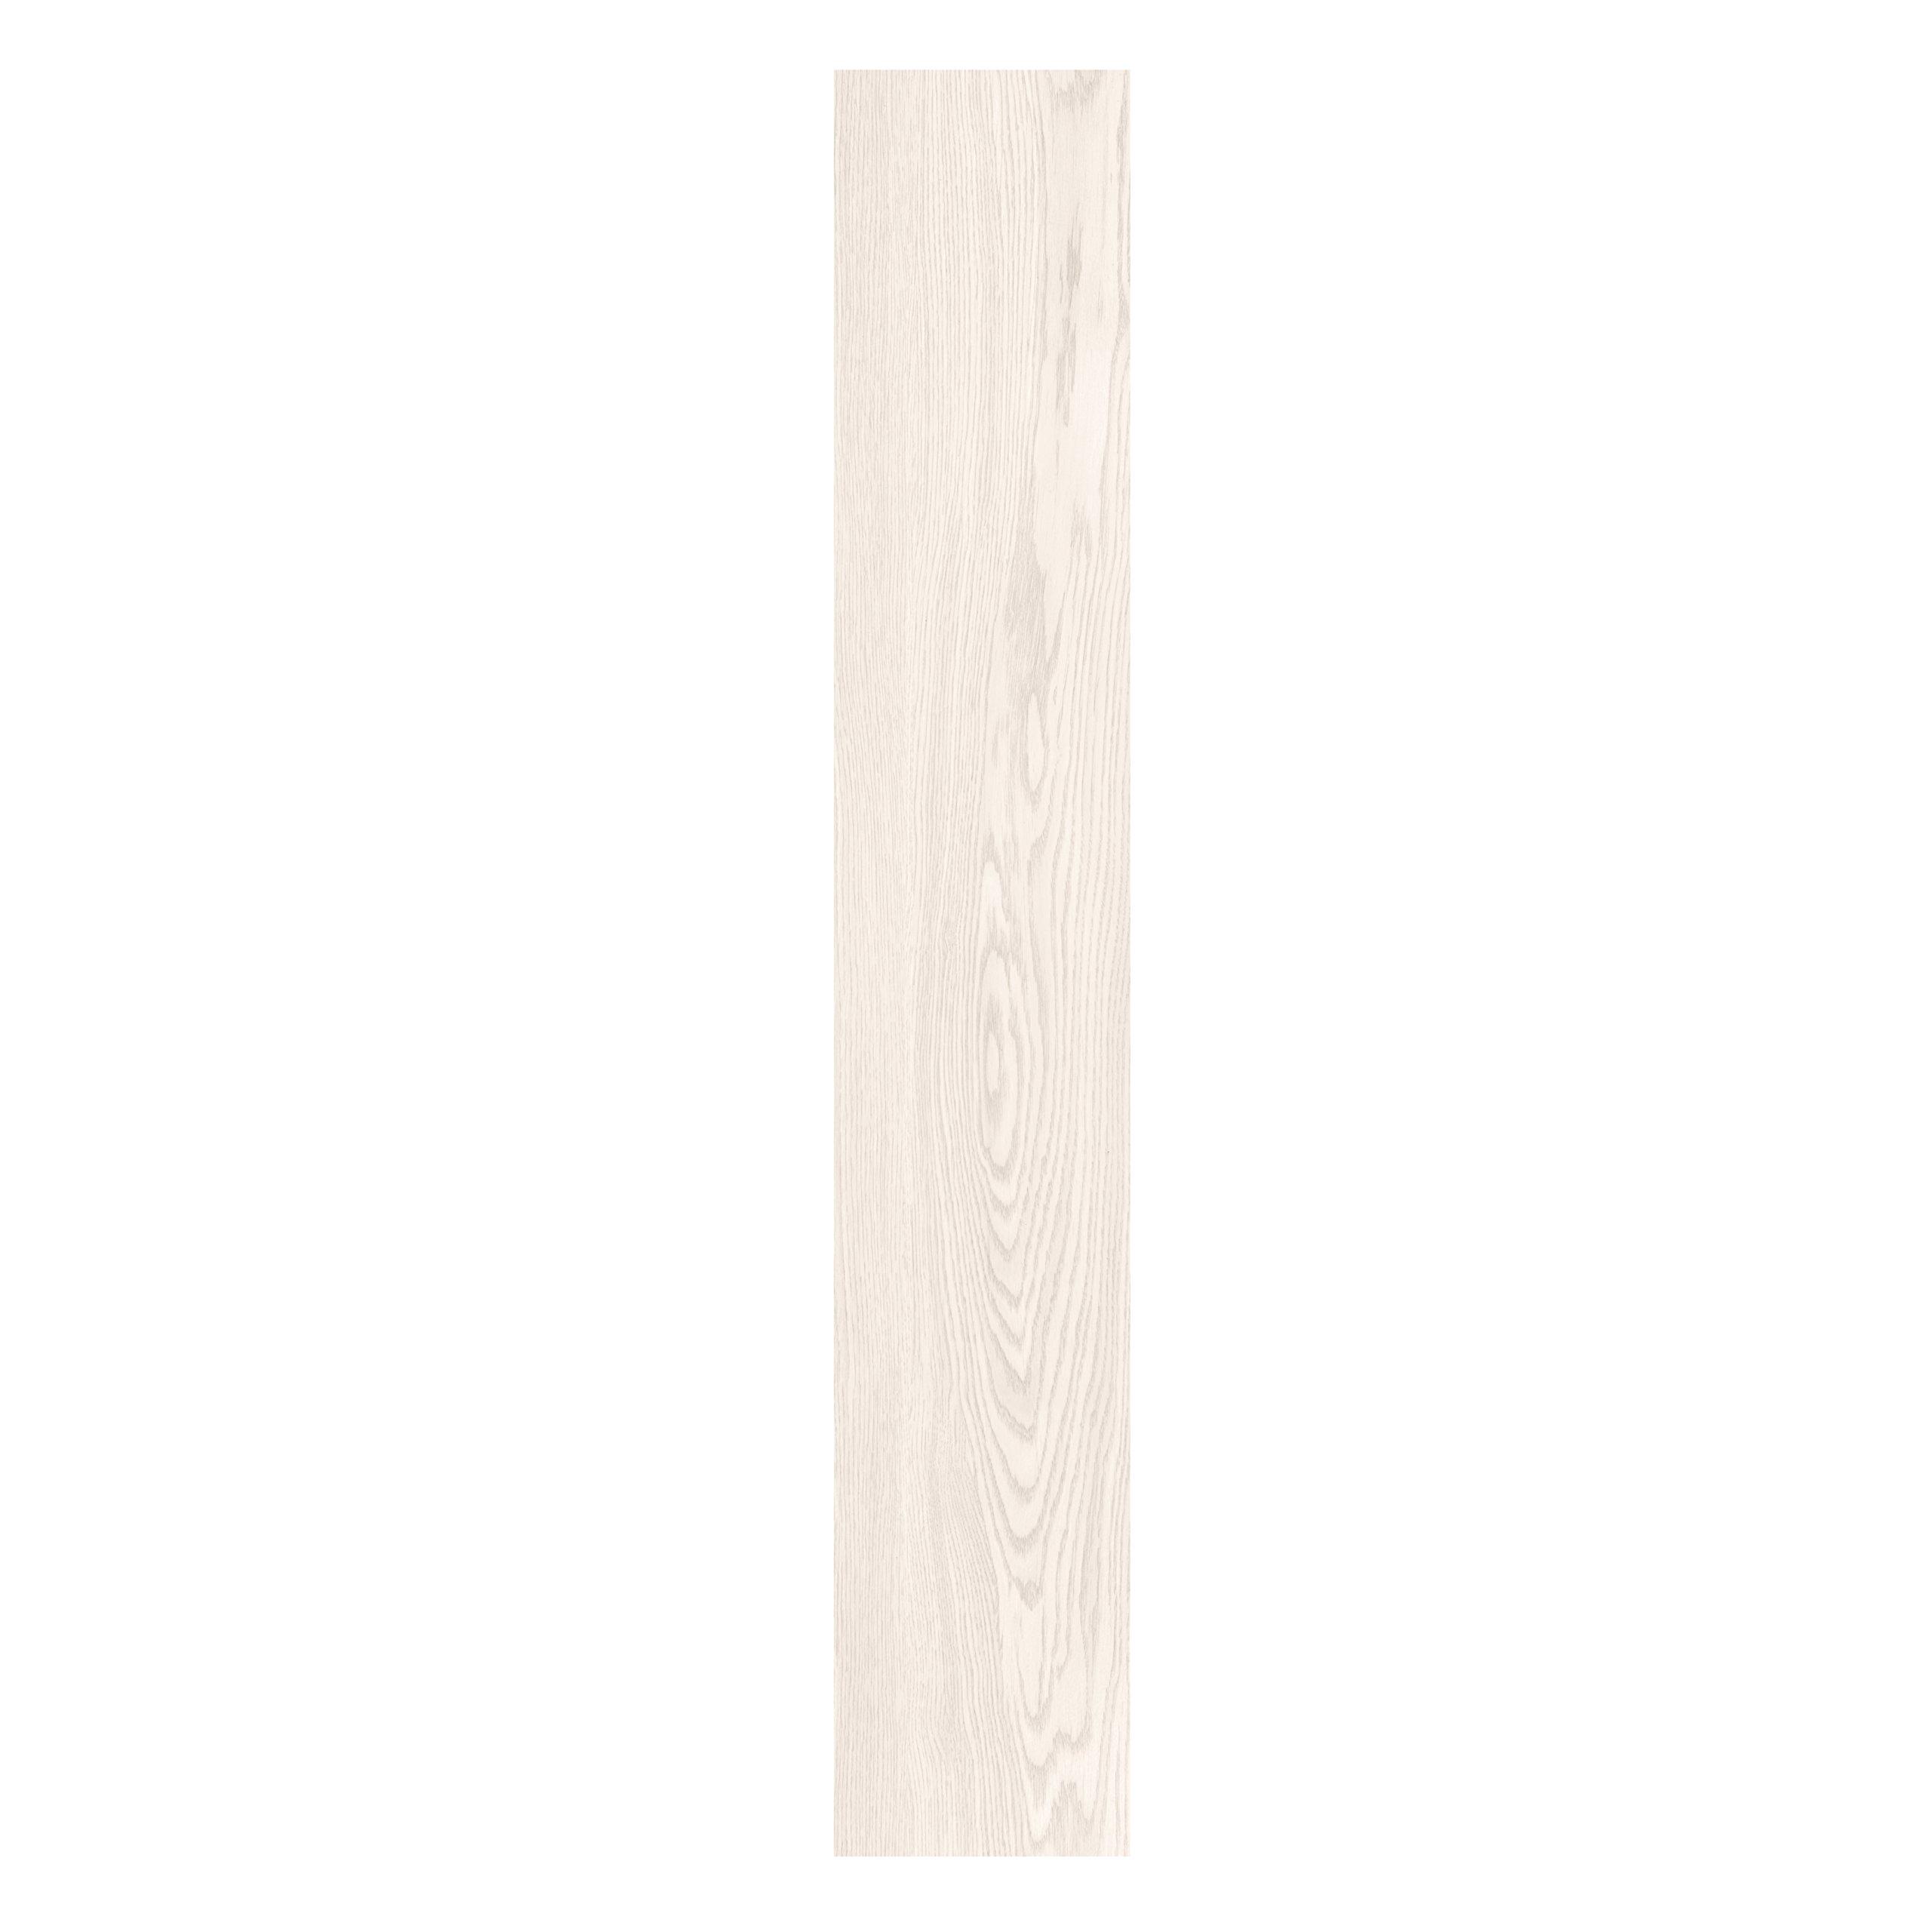 Achim Imports VFP1.2WO10 Nexus White Oak 6x36 Self Adhesive Vinyl Floor Planks-10 Planks/15 sq ft, Piece